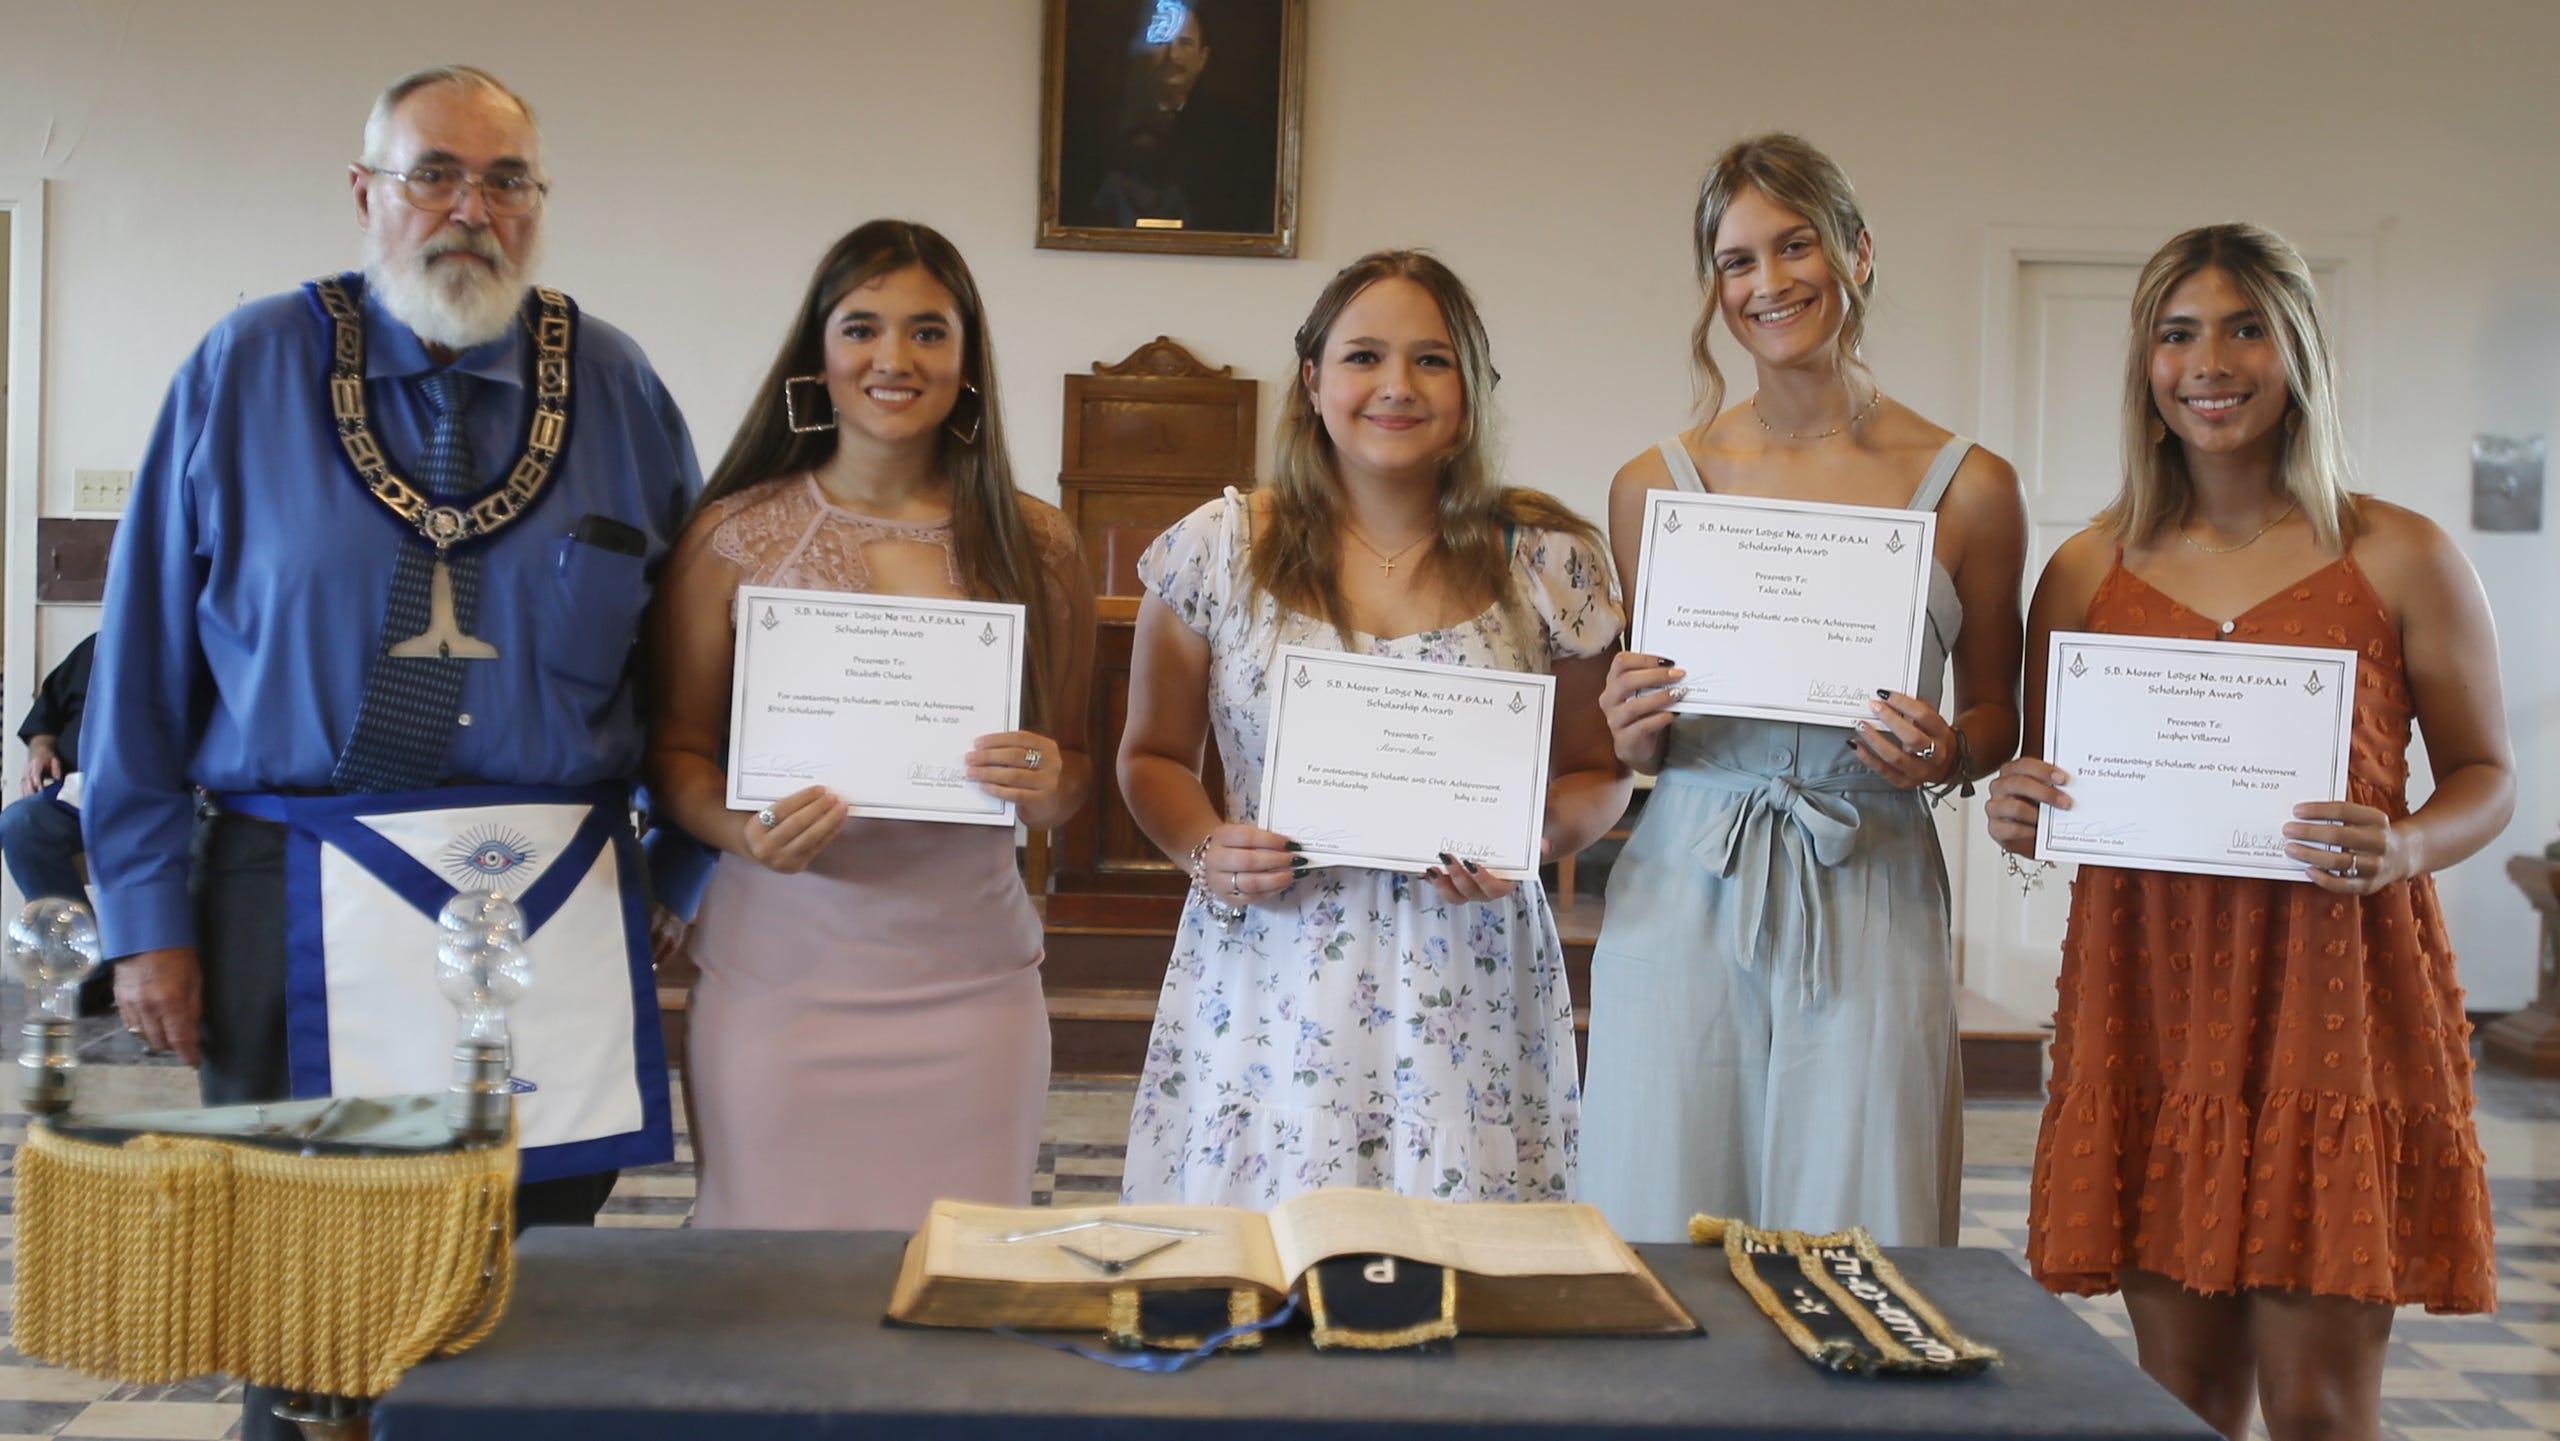 Texas, U.S. - Area graduates receive scholarships from S.B. Mosser Masonic Lodge #912